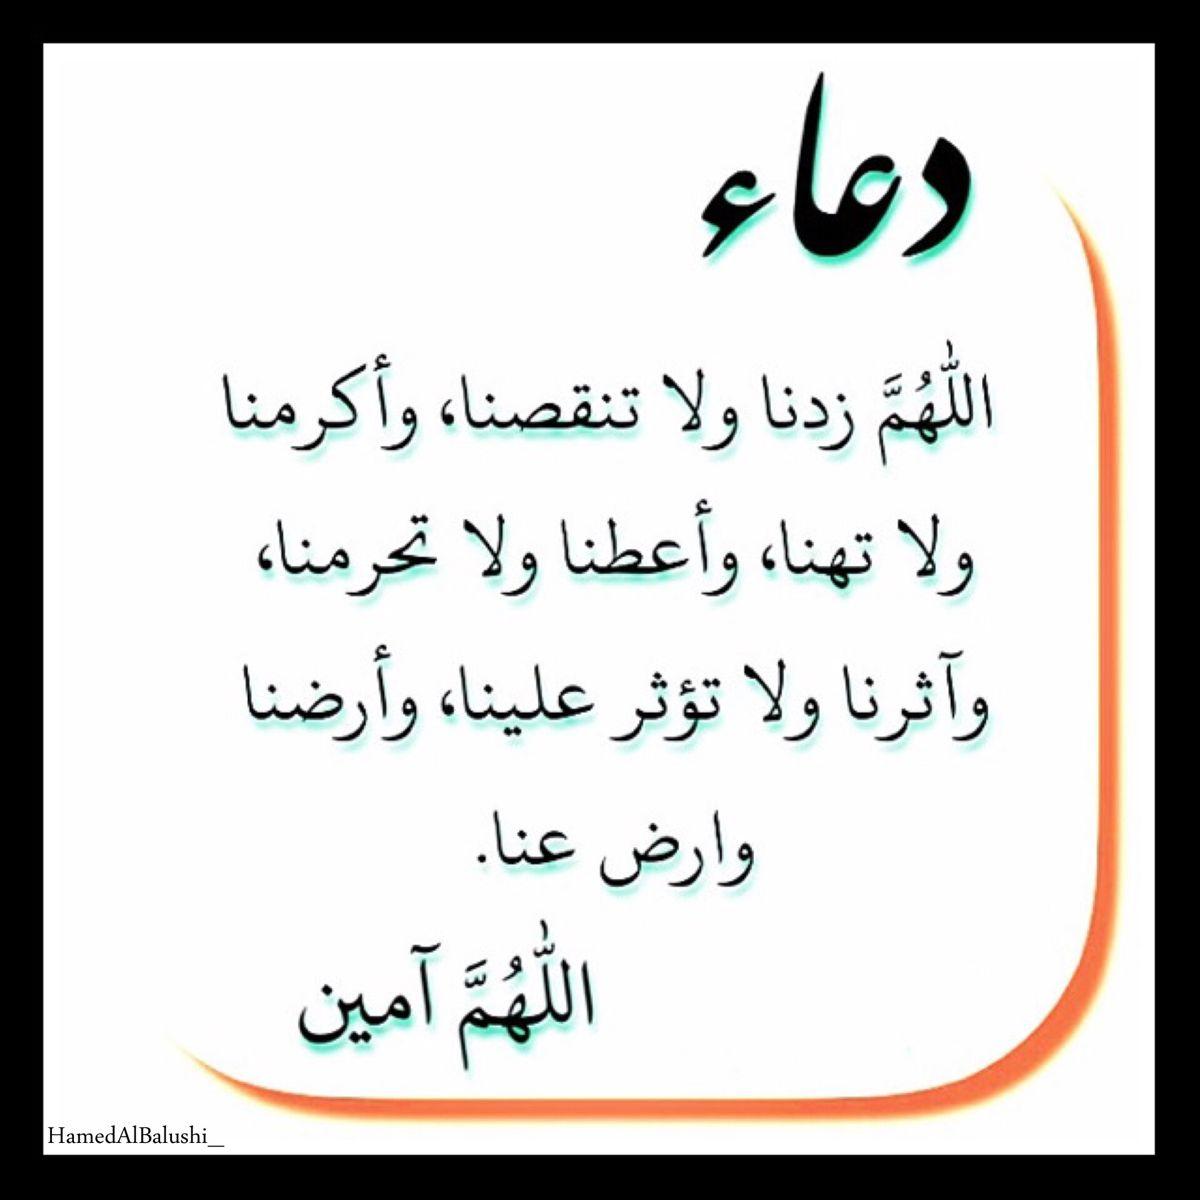 Pin By حمد البلوشي On دعاء Arabic Calligraphy Calligraphy Islam